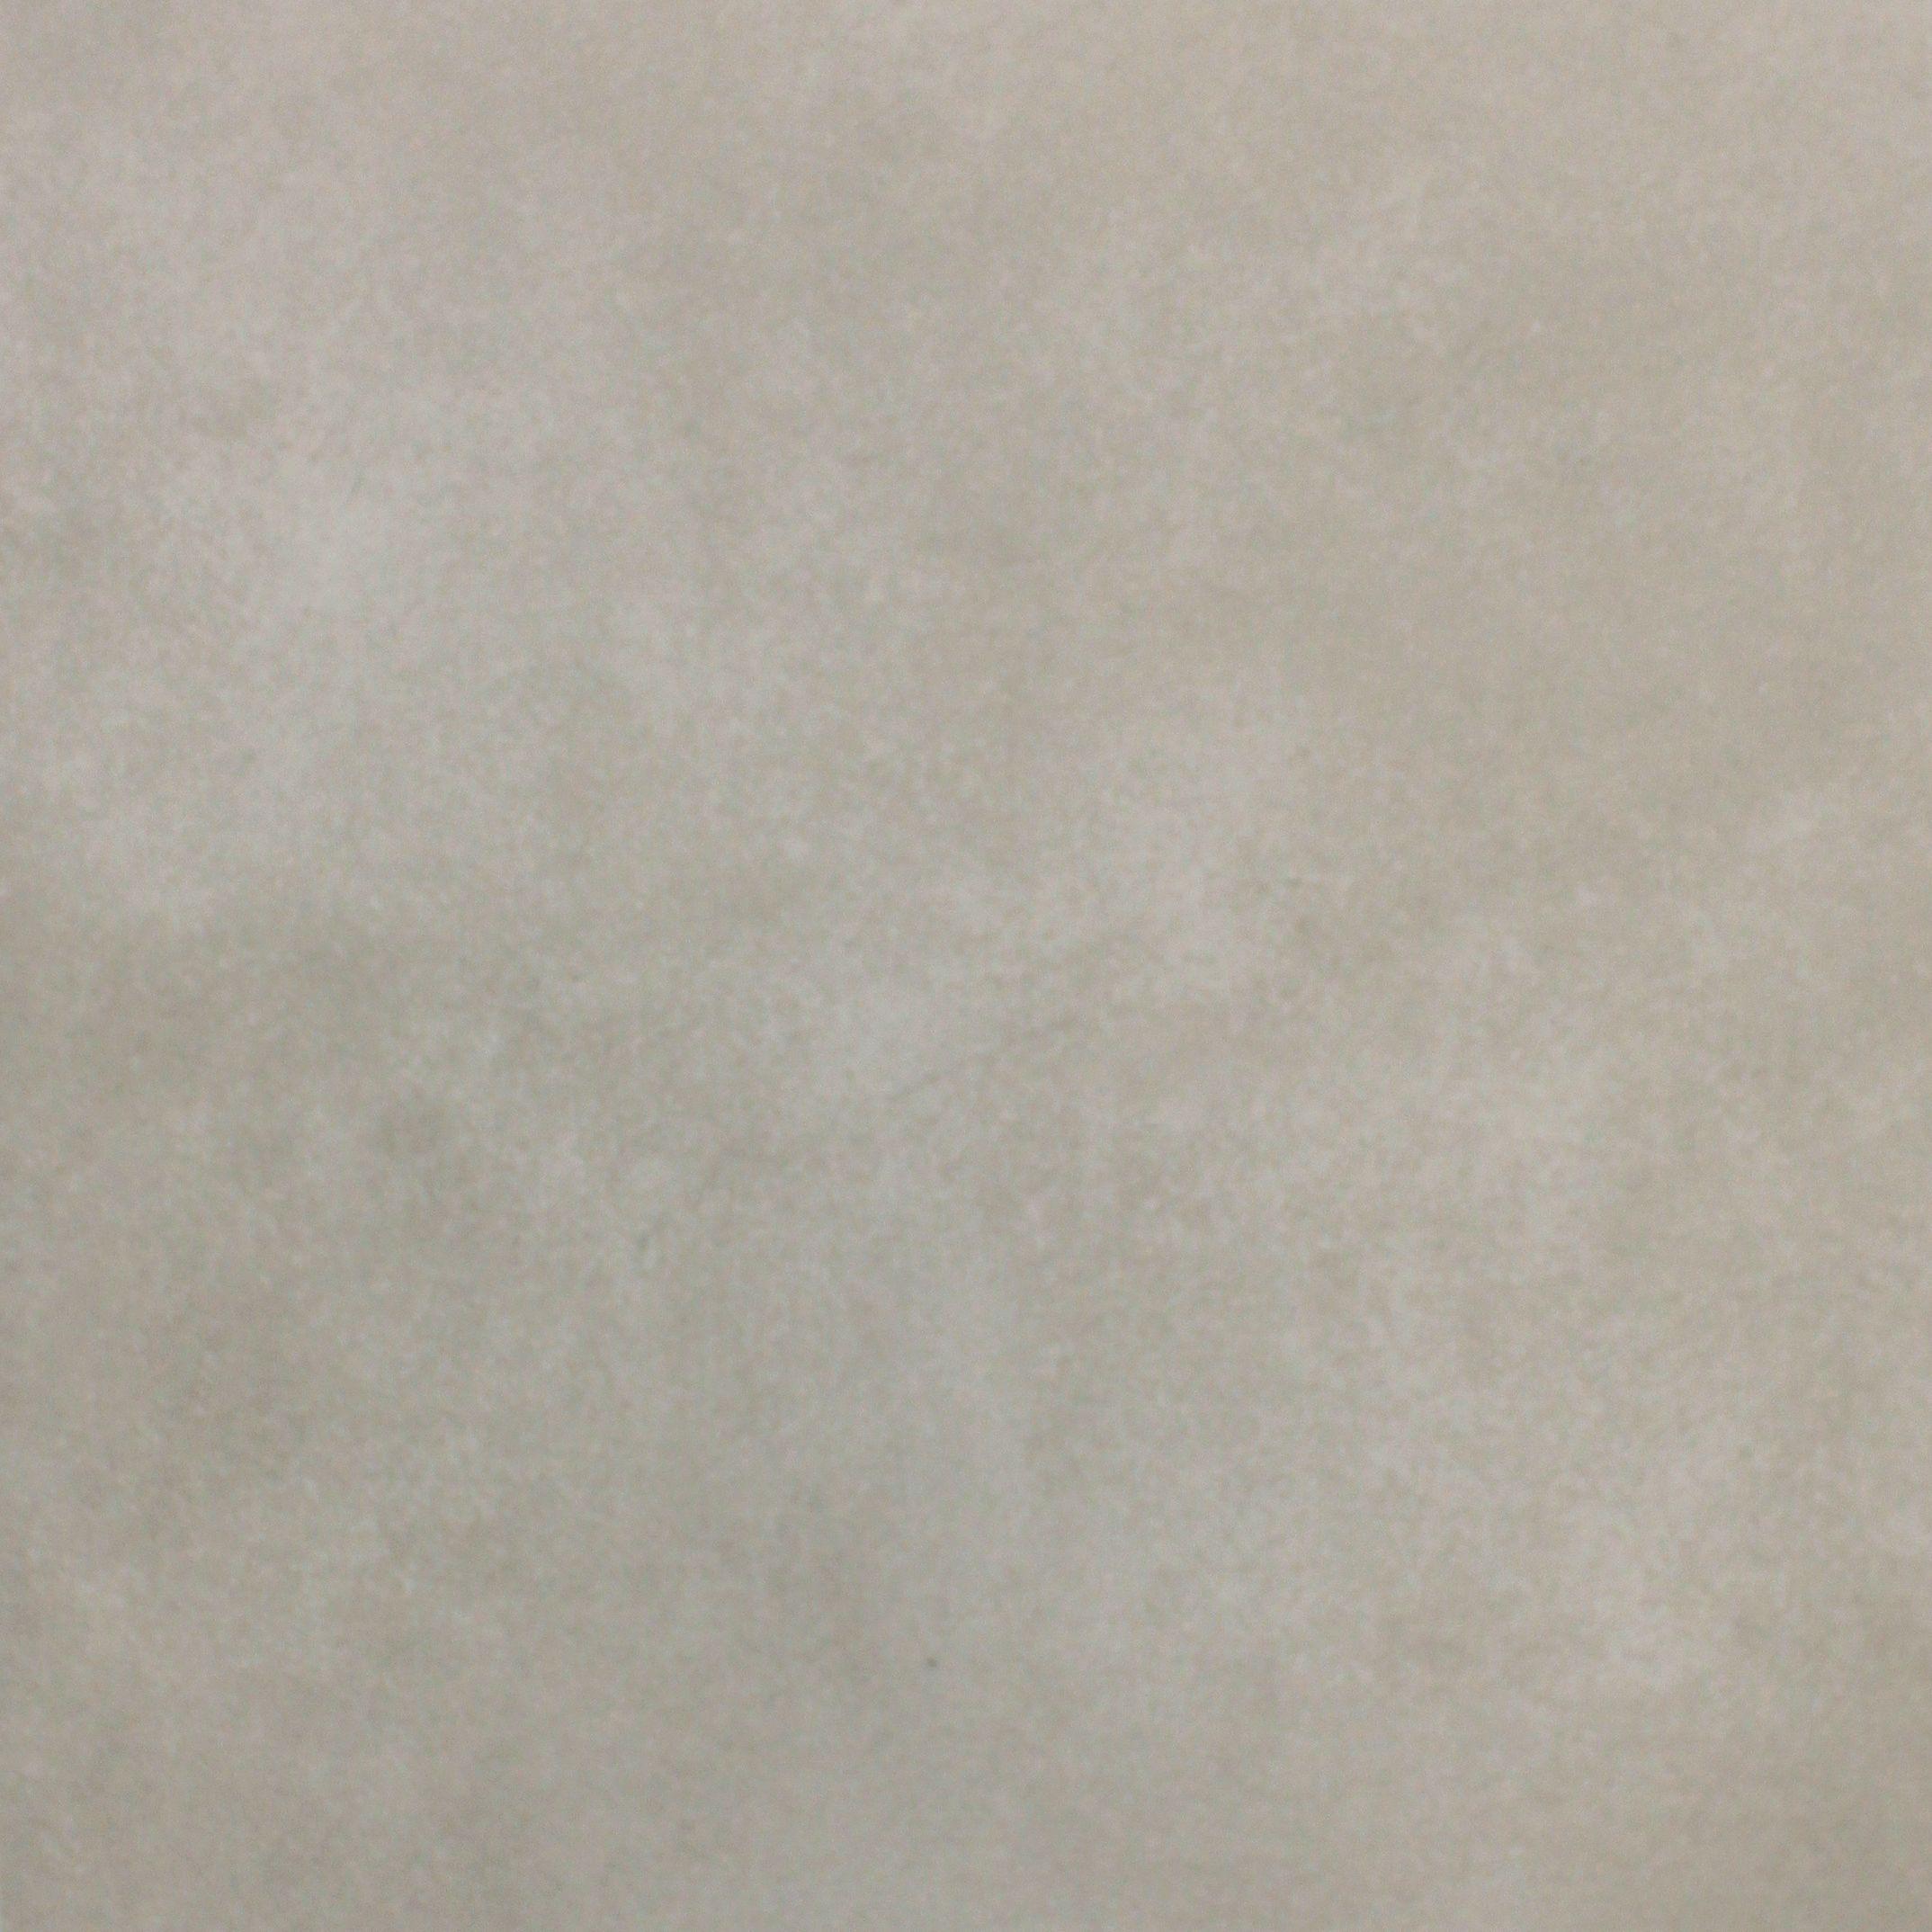 Holborn White Ceramic Wall Tile Pack Of 20 L 250mm W: Helena Light Grey Ceramic Wall Tile, Pack Of 20, (L)250mm